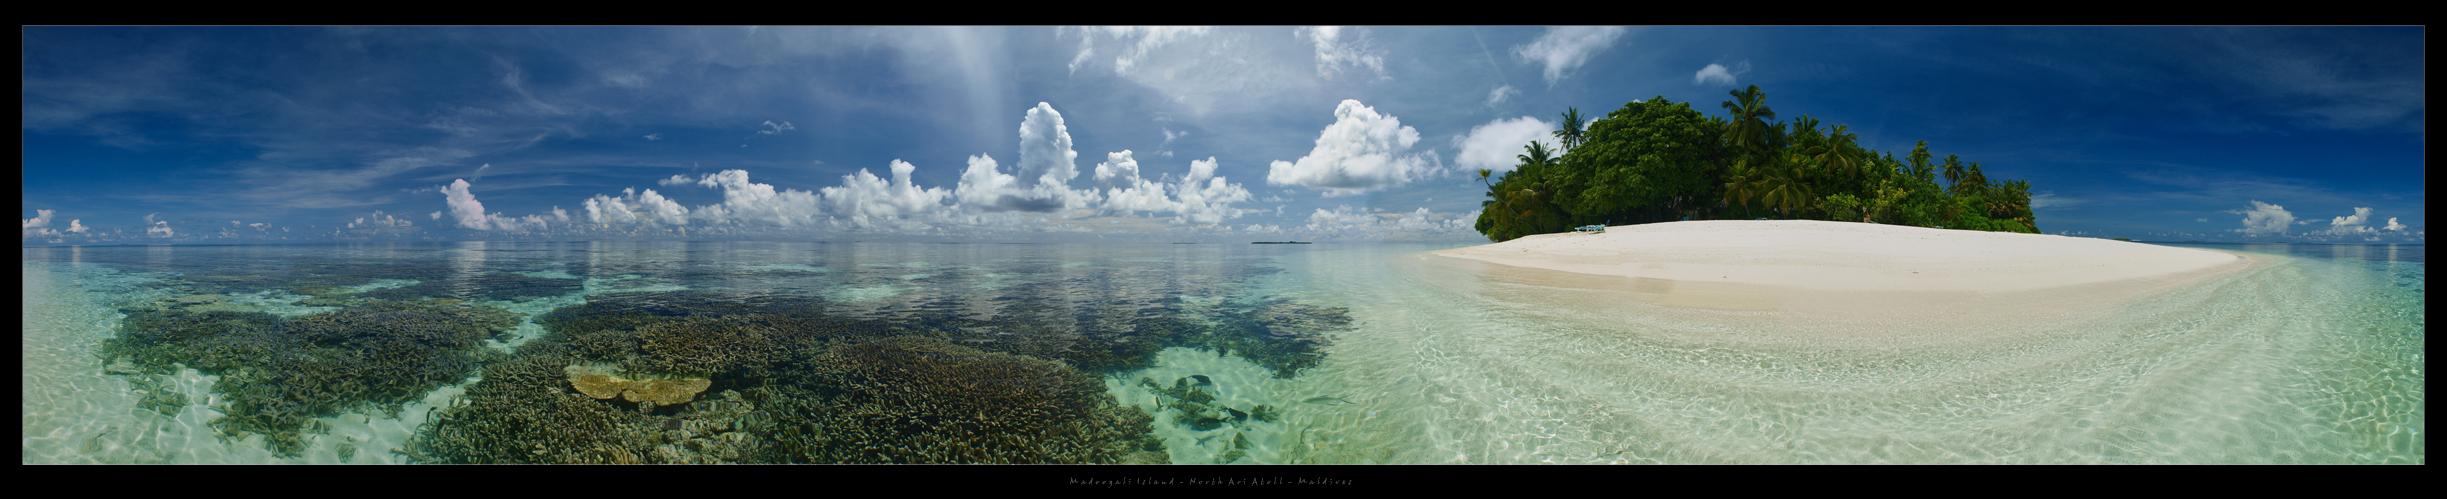 Madoogali Island Pano - North Ari (Alifu) Atoll - Maldives 2012